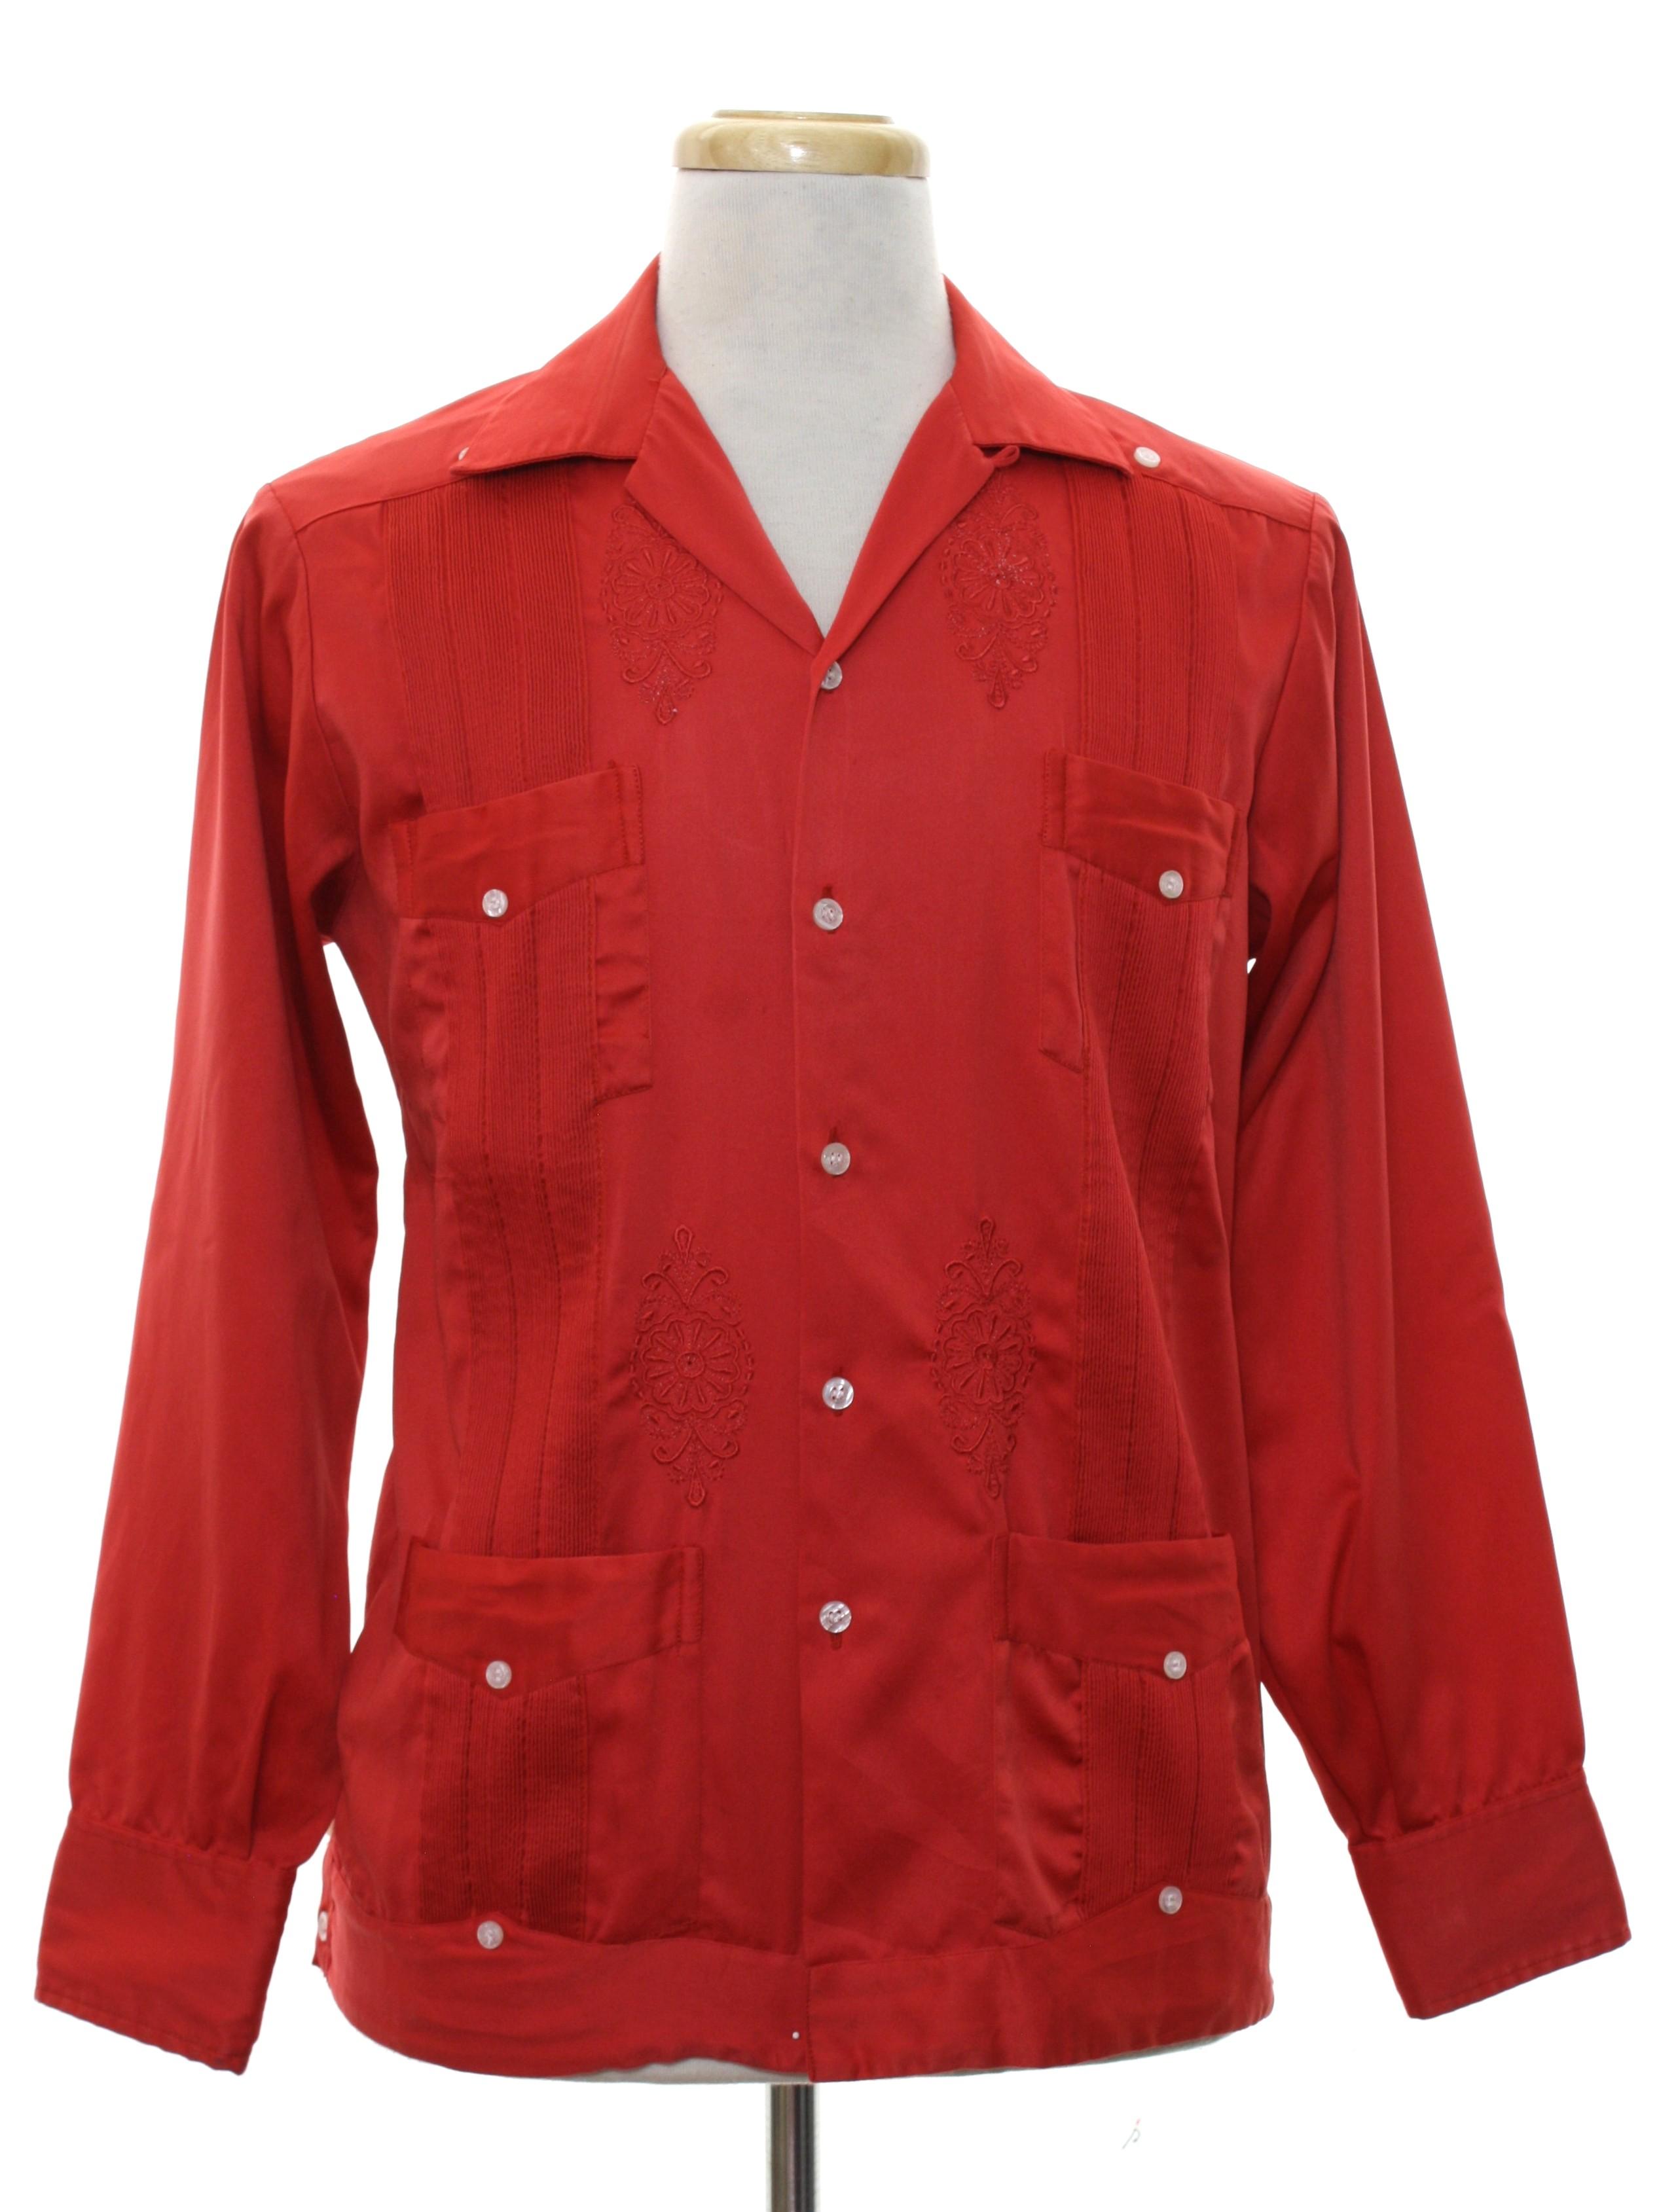 0030addbdf Vintage Guayaberas Yucateca Eighties Guayabera Shirt  80s ...